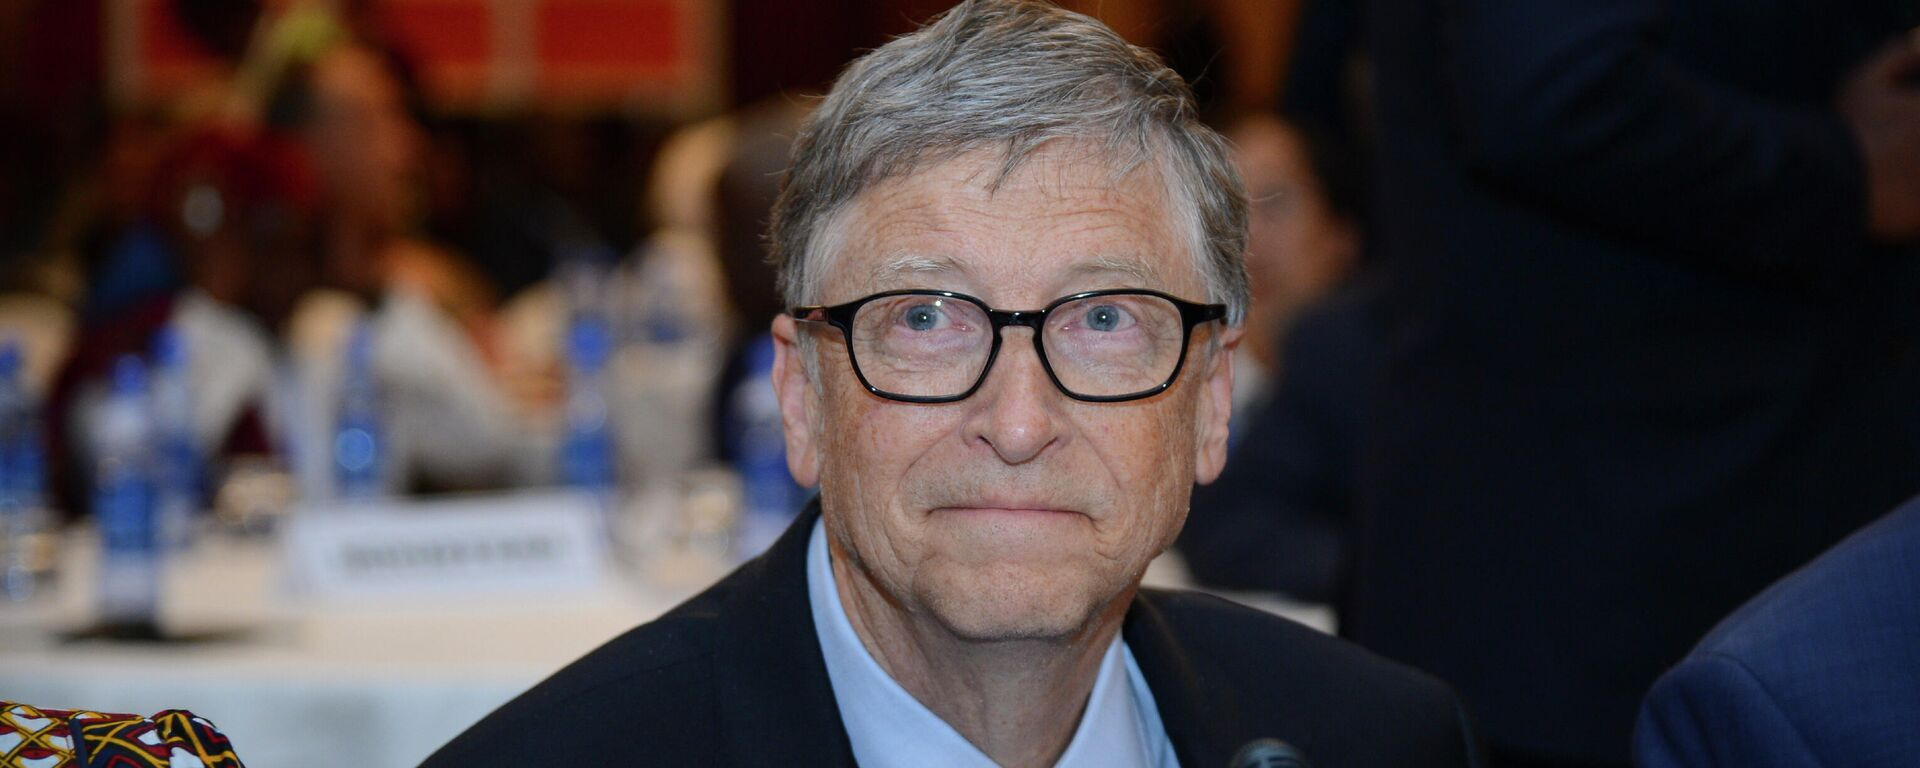 El cofundador de Microsoft, Bill Gates - Sputnik Mundo, 1920, 20.03.2021